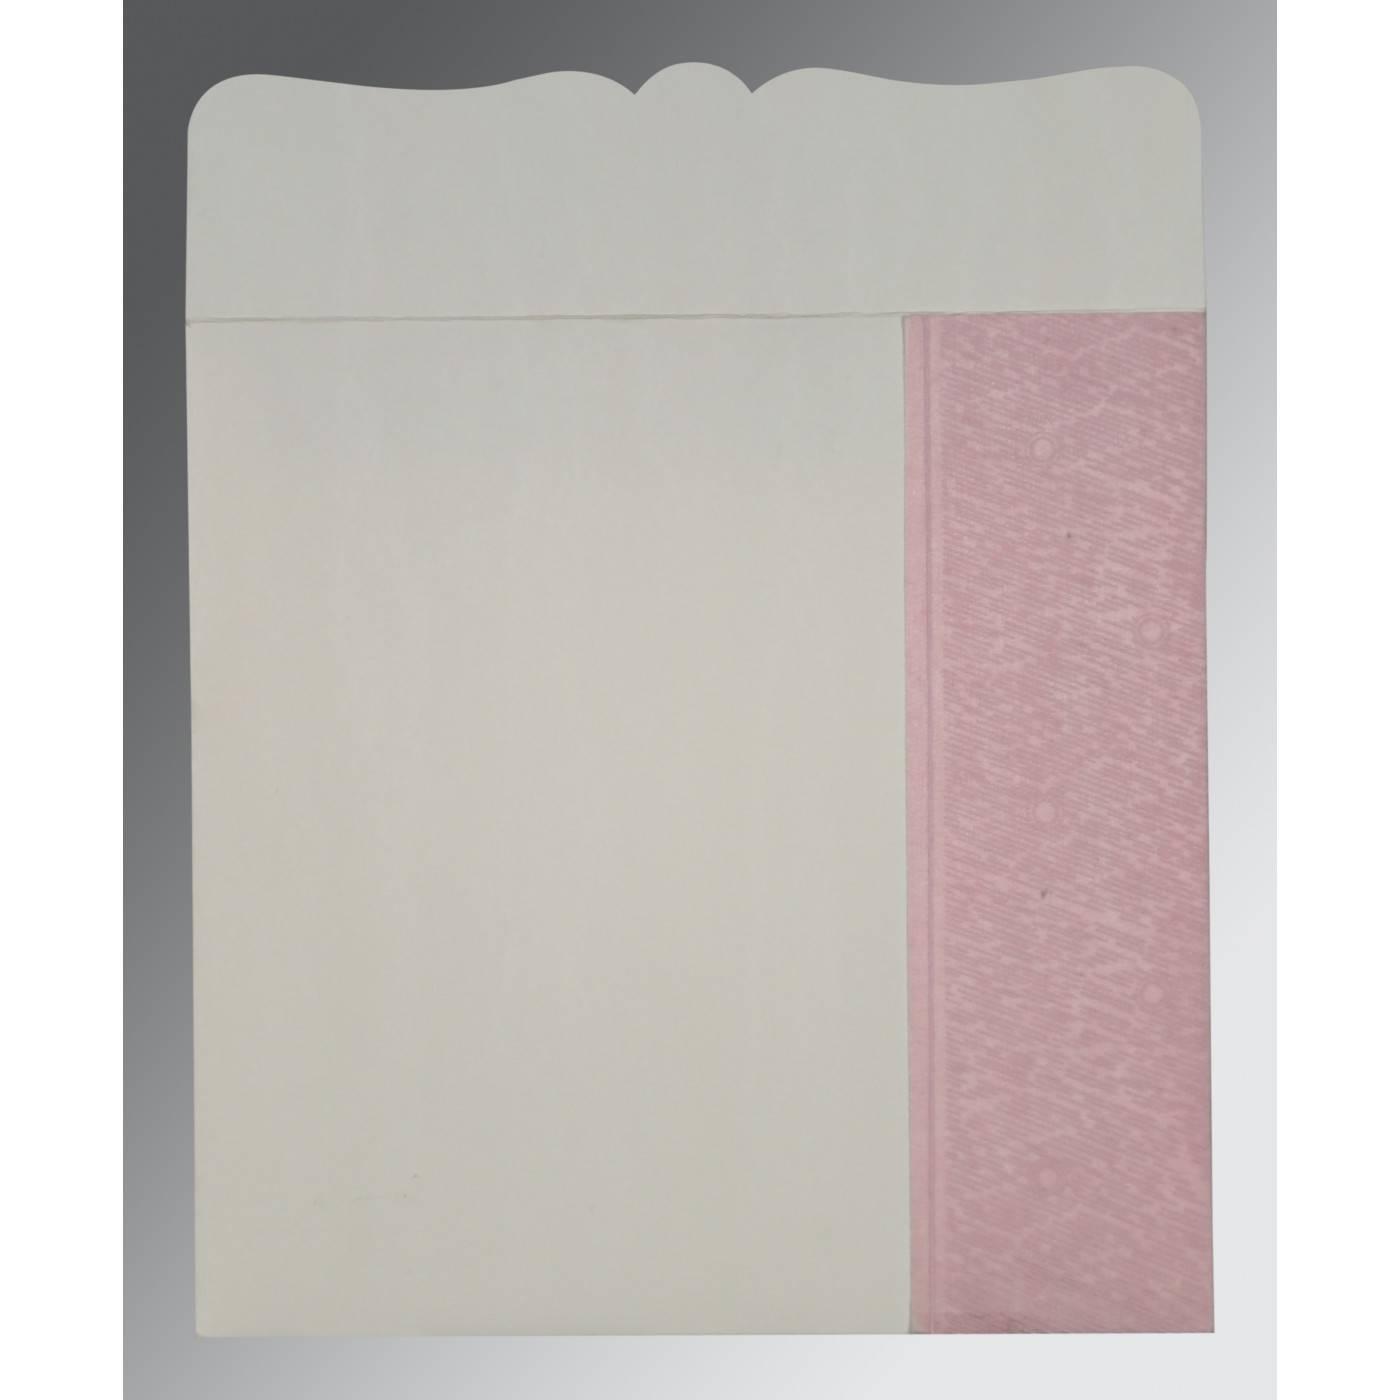 AZALEA PINK SHIMMERY FLORAL THEMED - EMBOSSED WEDDING CARD : CIN-8209H - IndianWeddingCards